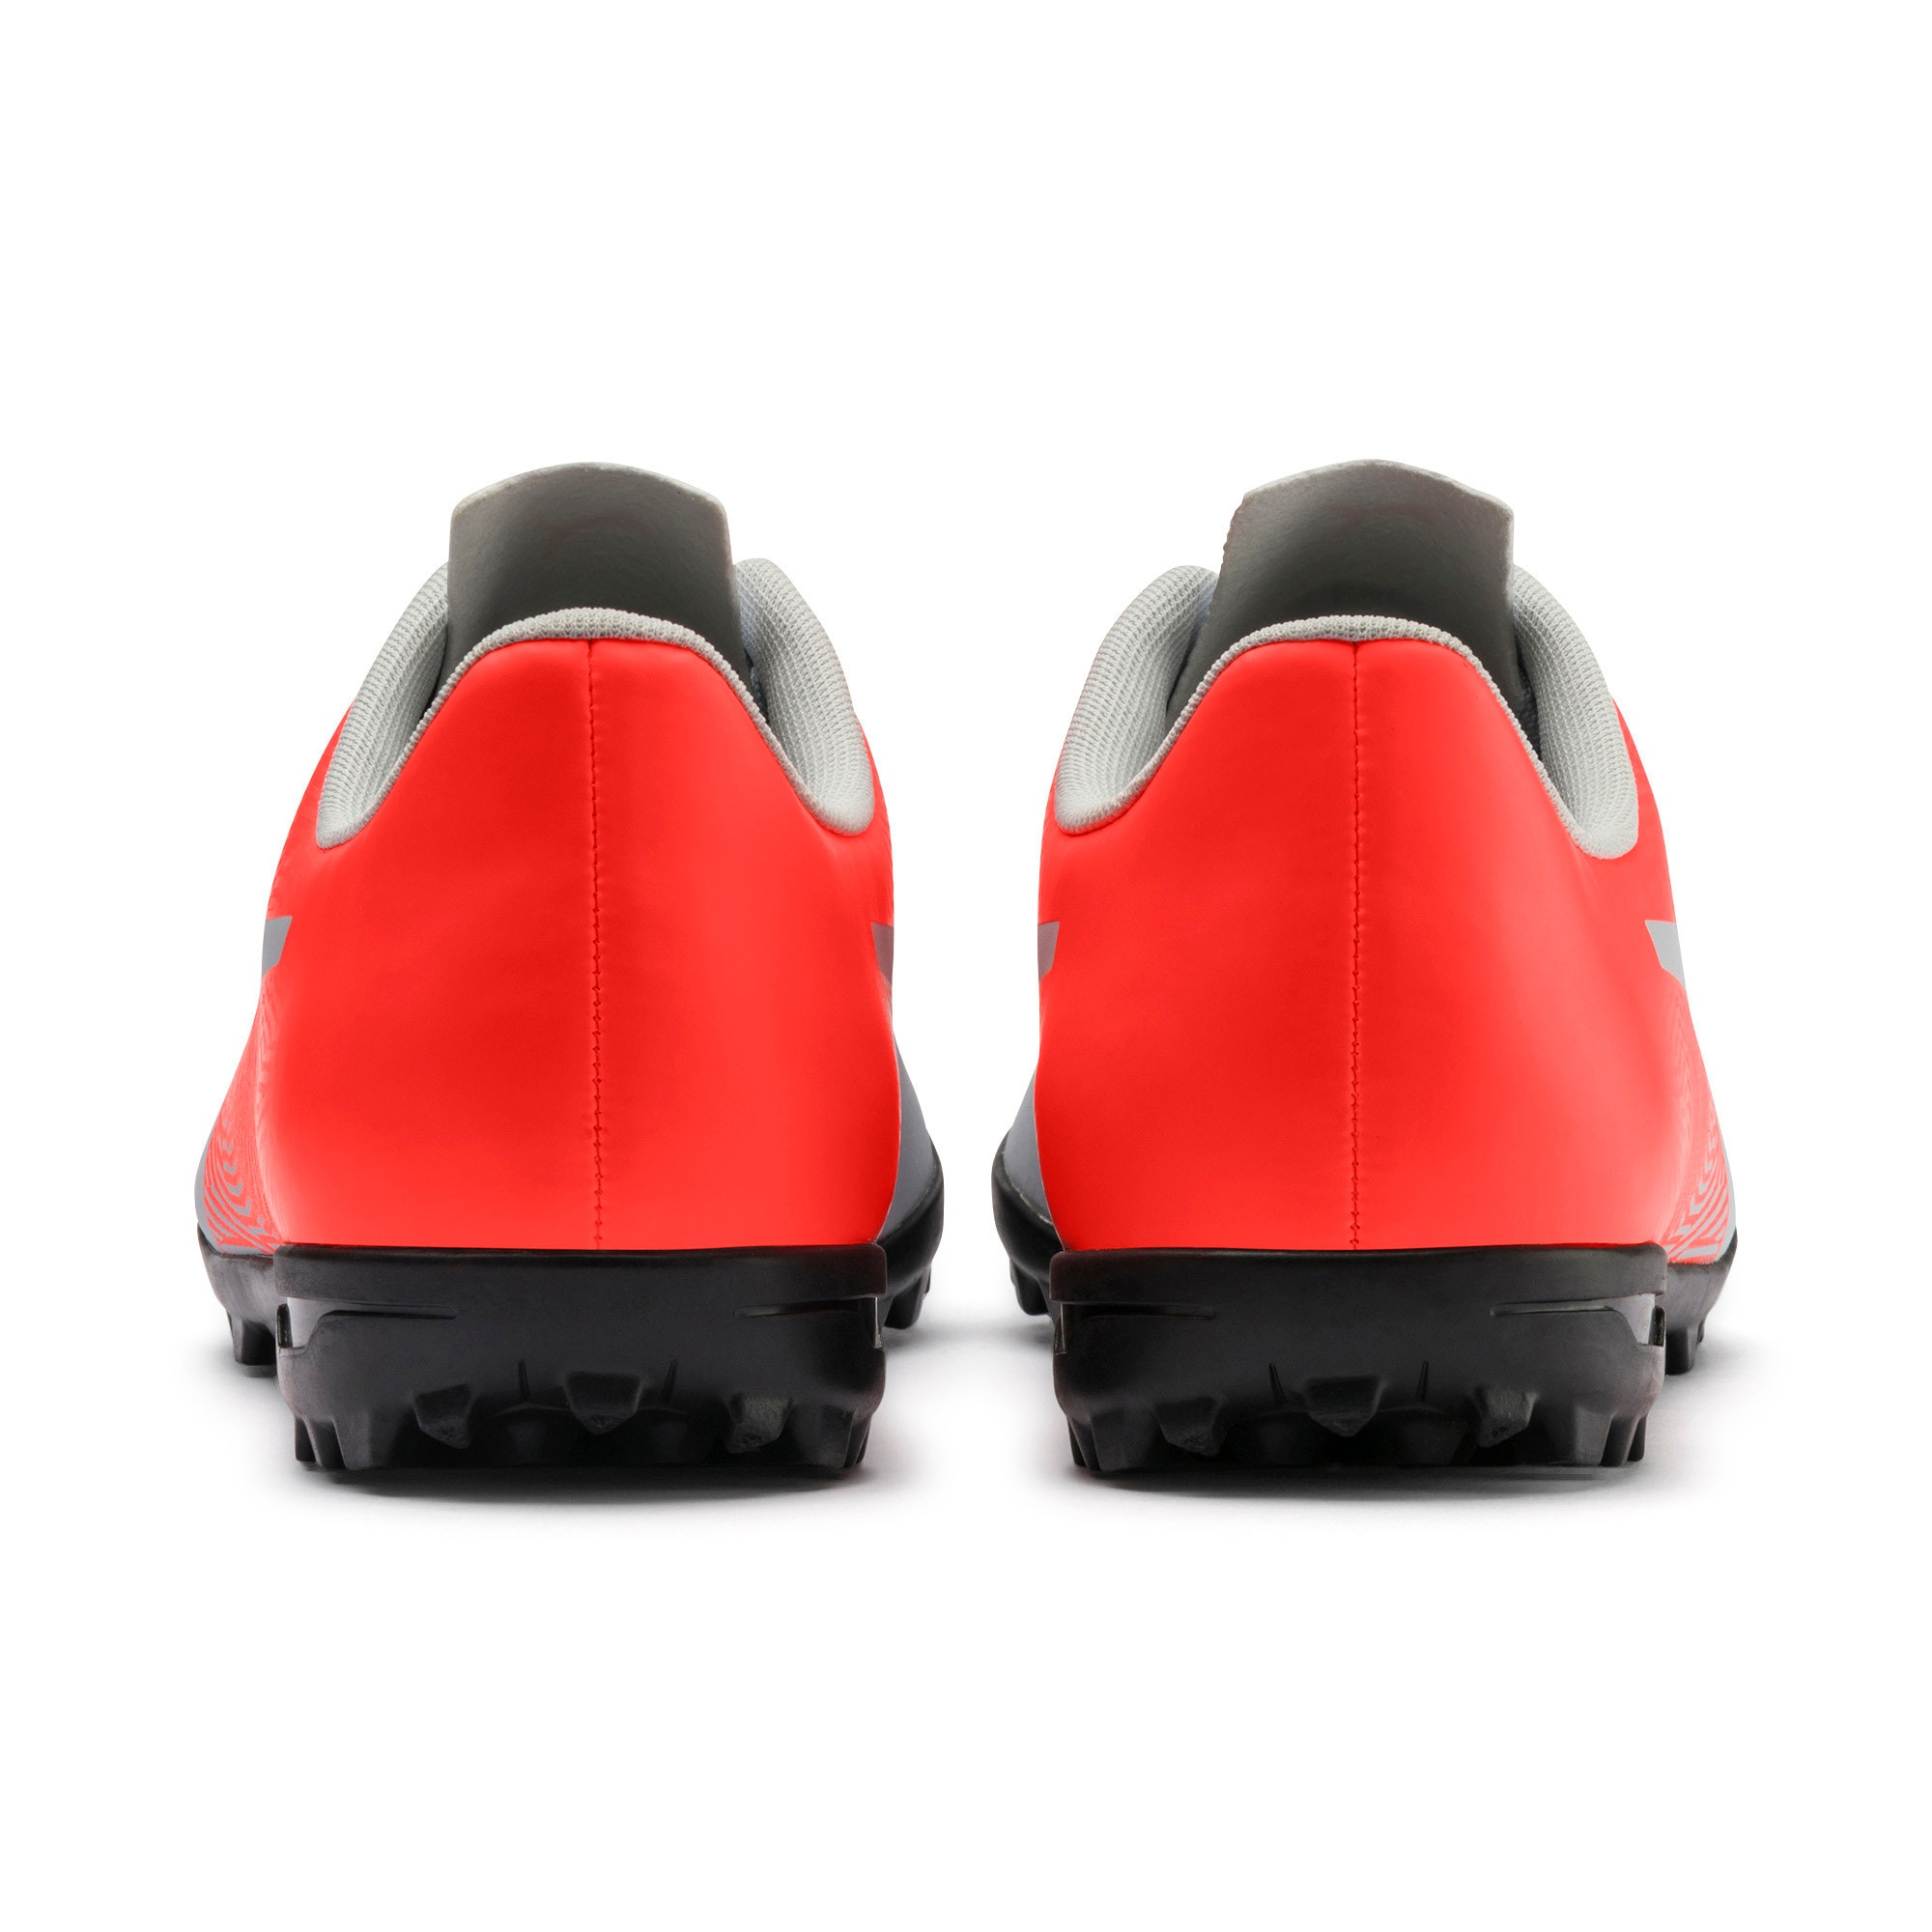 Thumbnail 4 of PUMA Spirit II TT Men's Soccer Shoes, Glacial Blue-Nrgy Red, medium